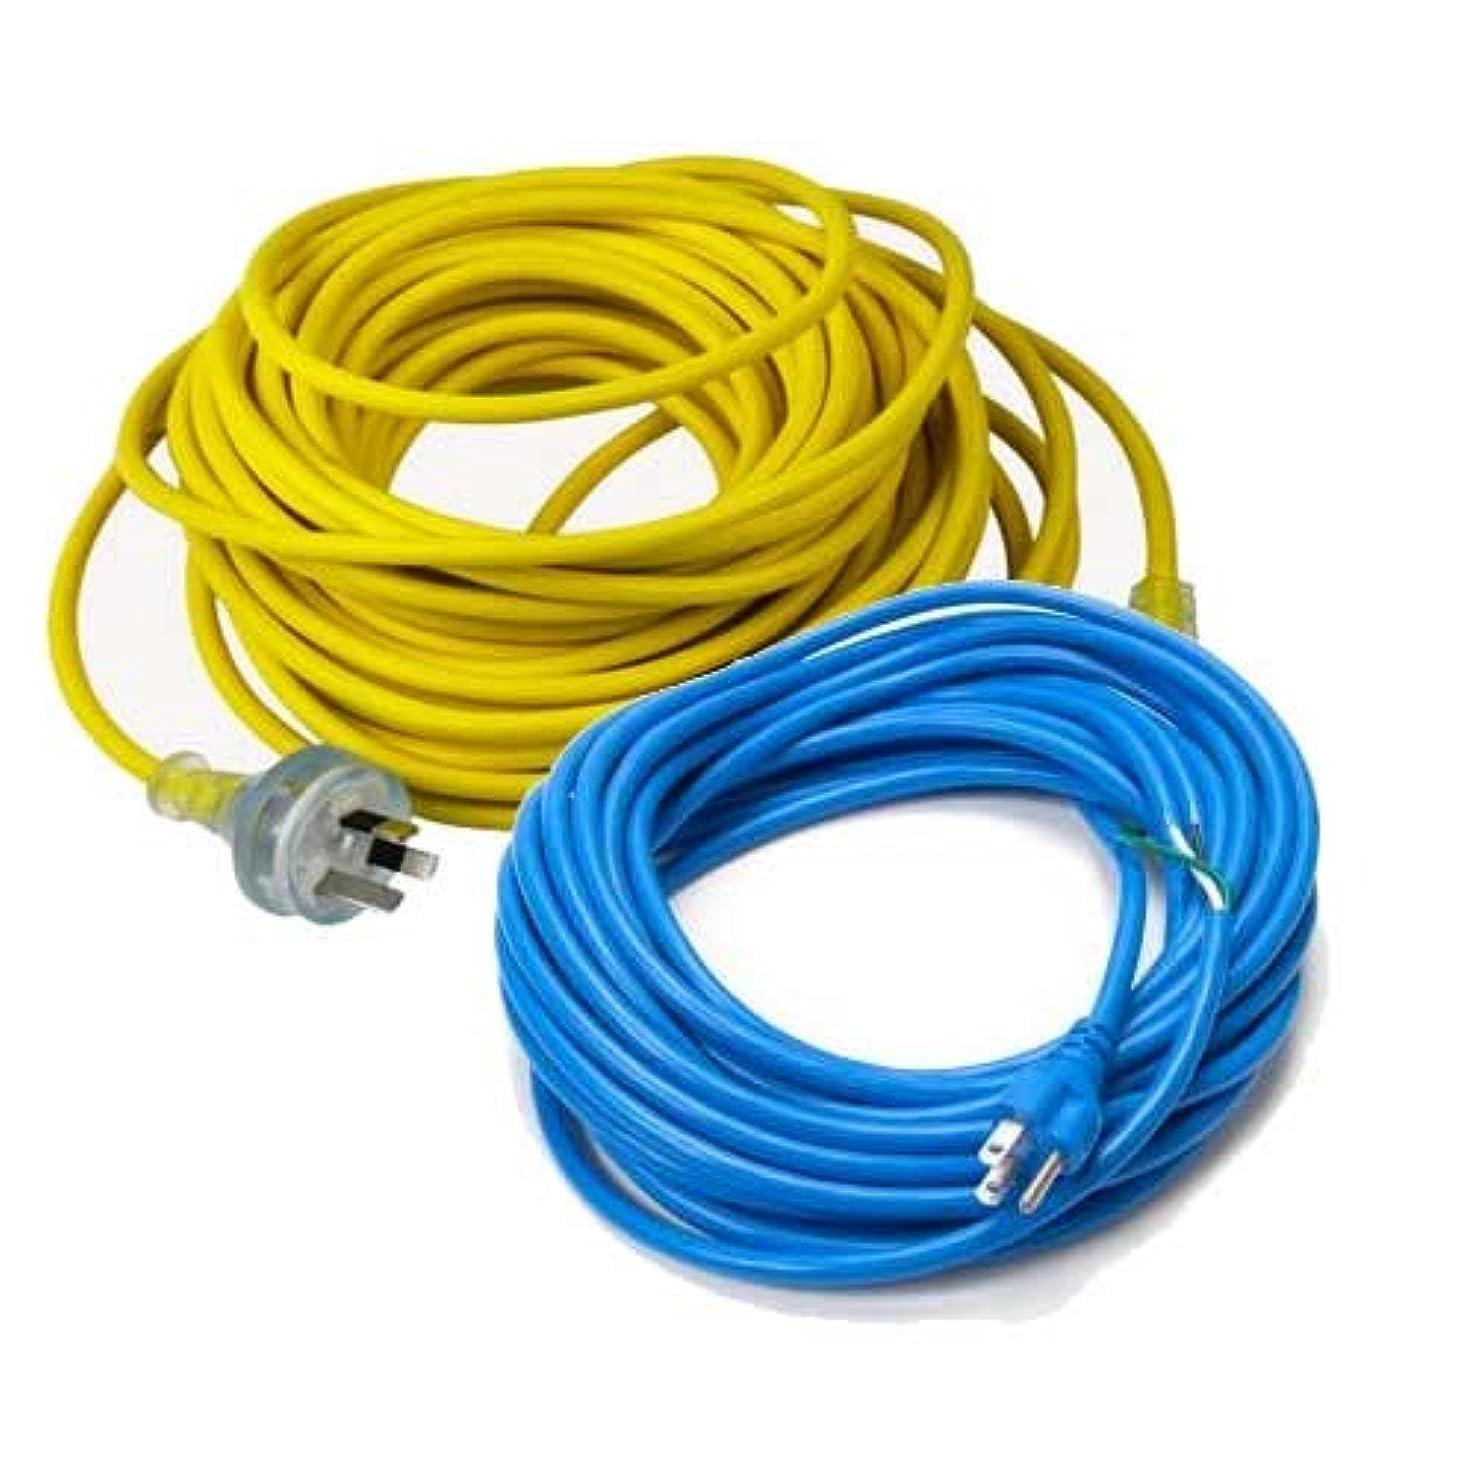 NSS Power Cord, 16/3 15' Black 300 64-9-5701